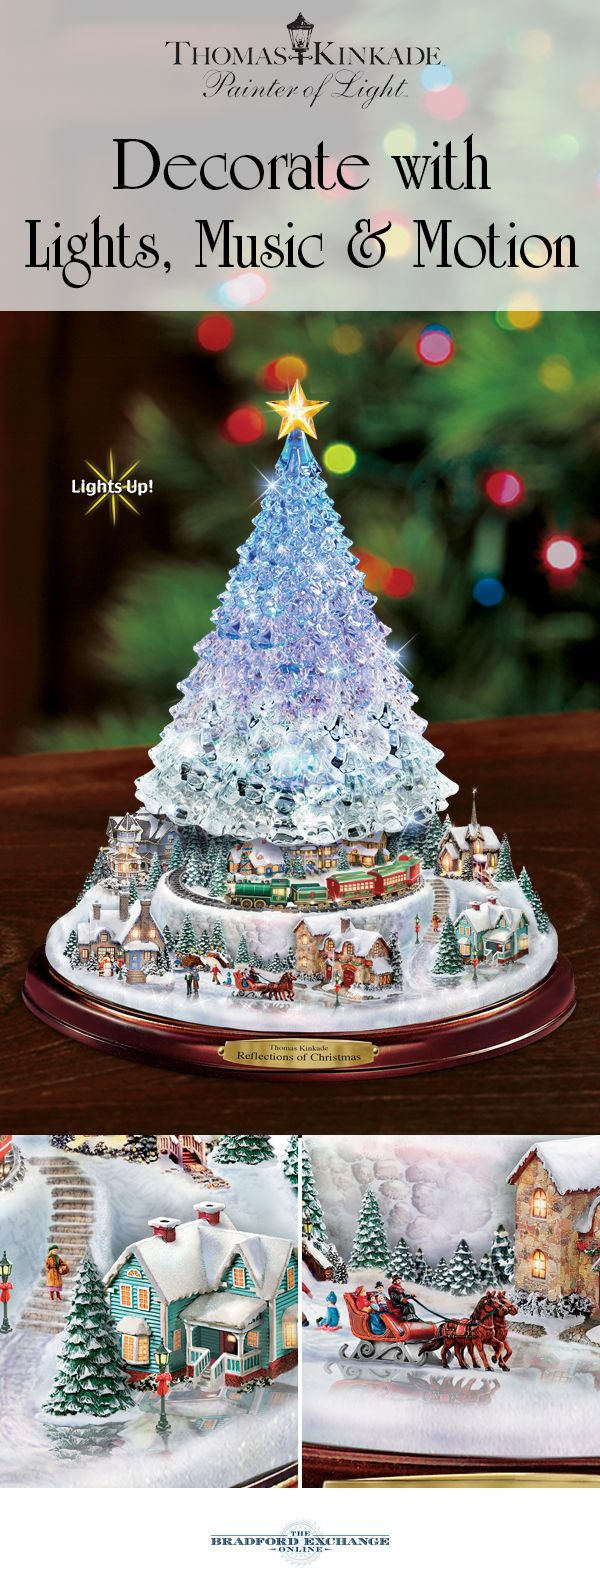 Thomas kinkade o holy night christmas stocking - Thomas Kinkade Christmas Tree With Lights Motion And Music